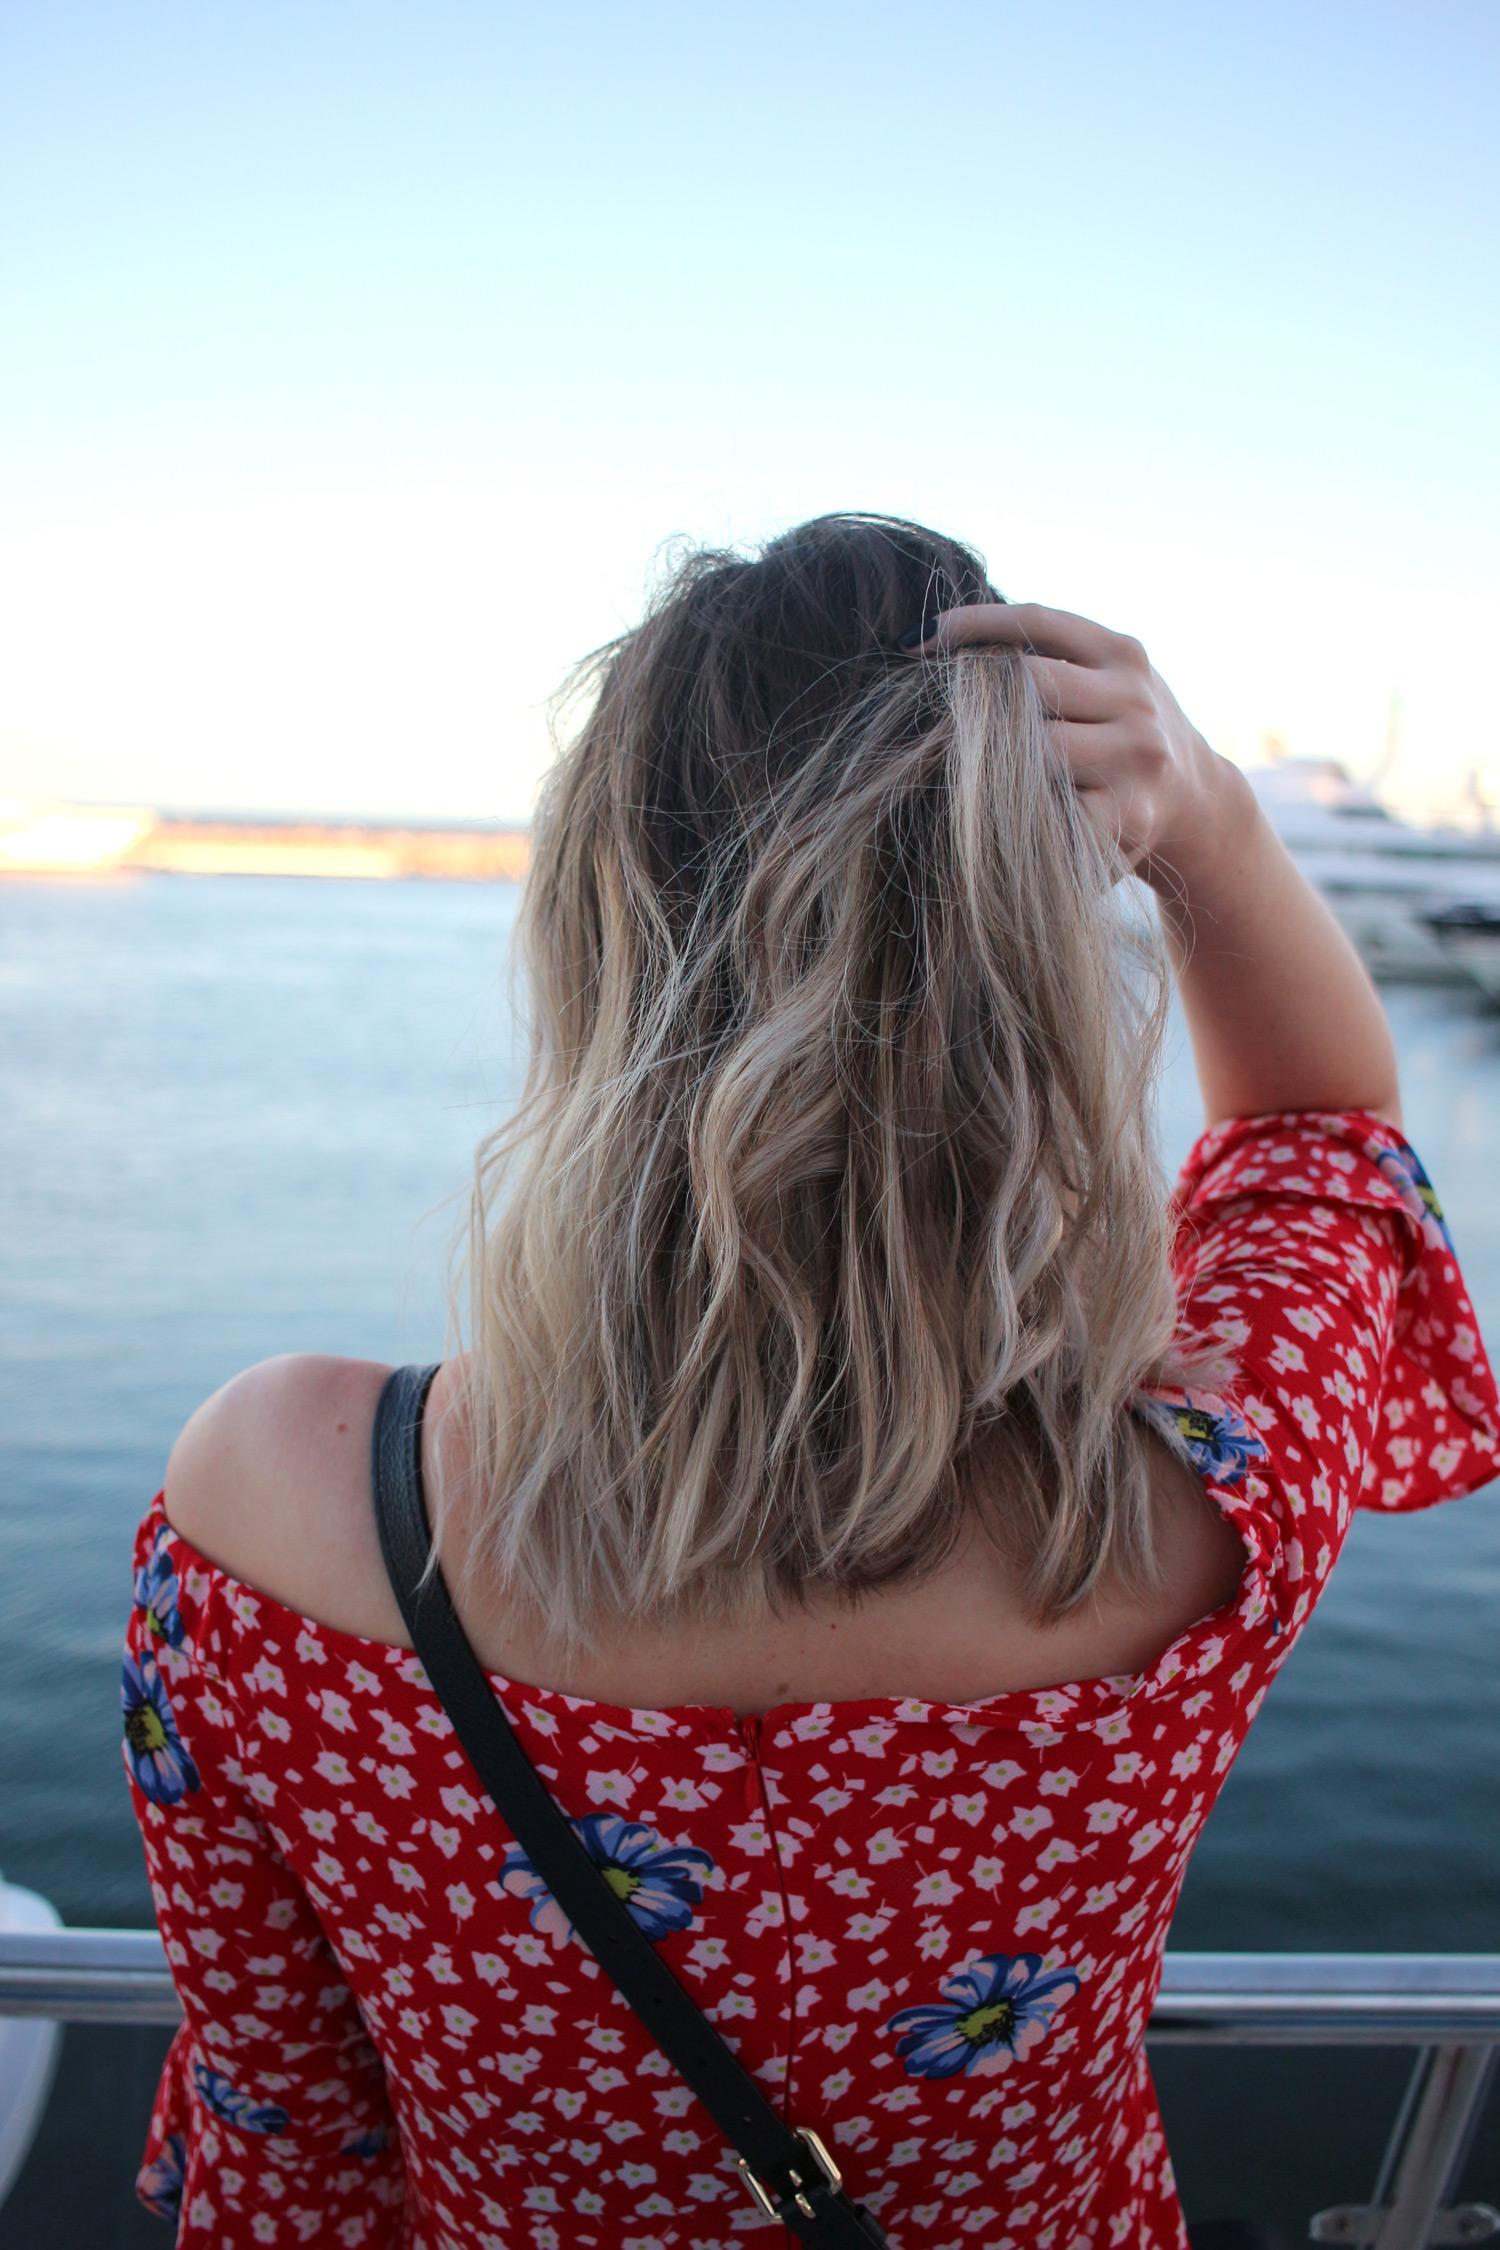 marbella-malaga-spain-travel-blogger-Puerto-Banus-4